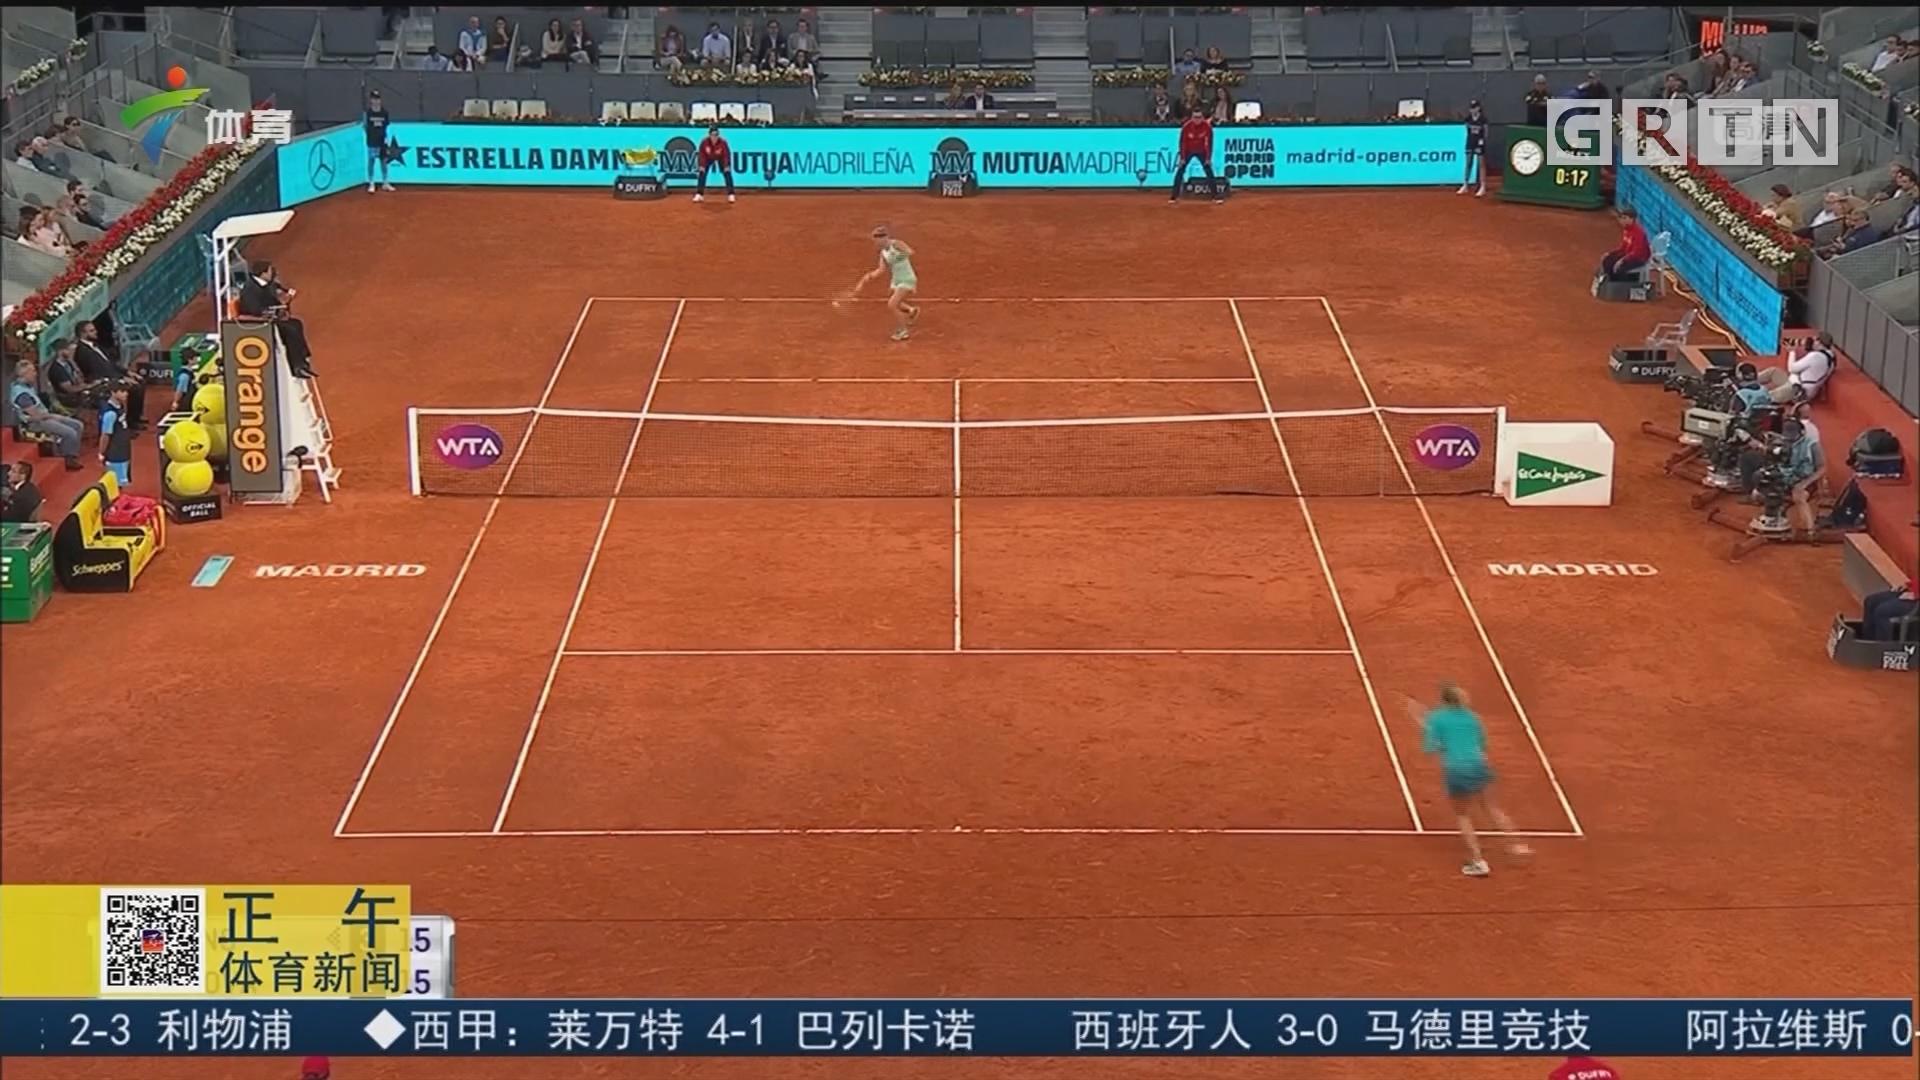 WTA马德里赛 科维托娃轻松晋级次轮